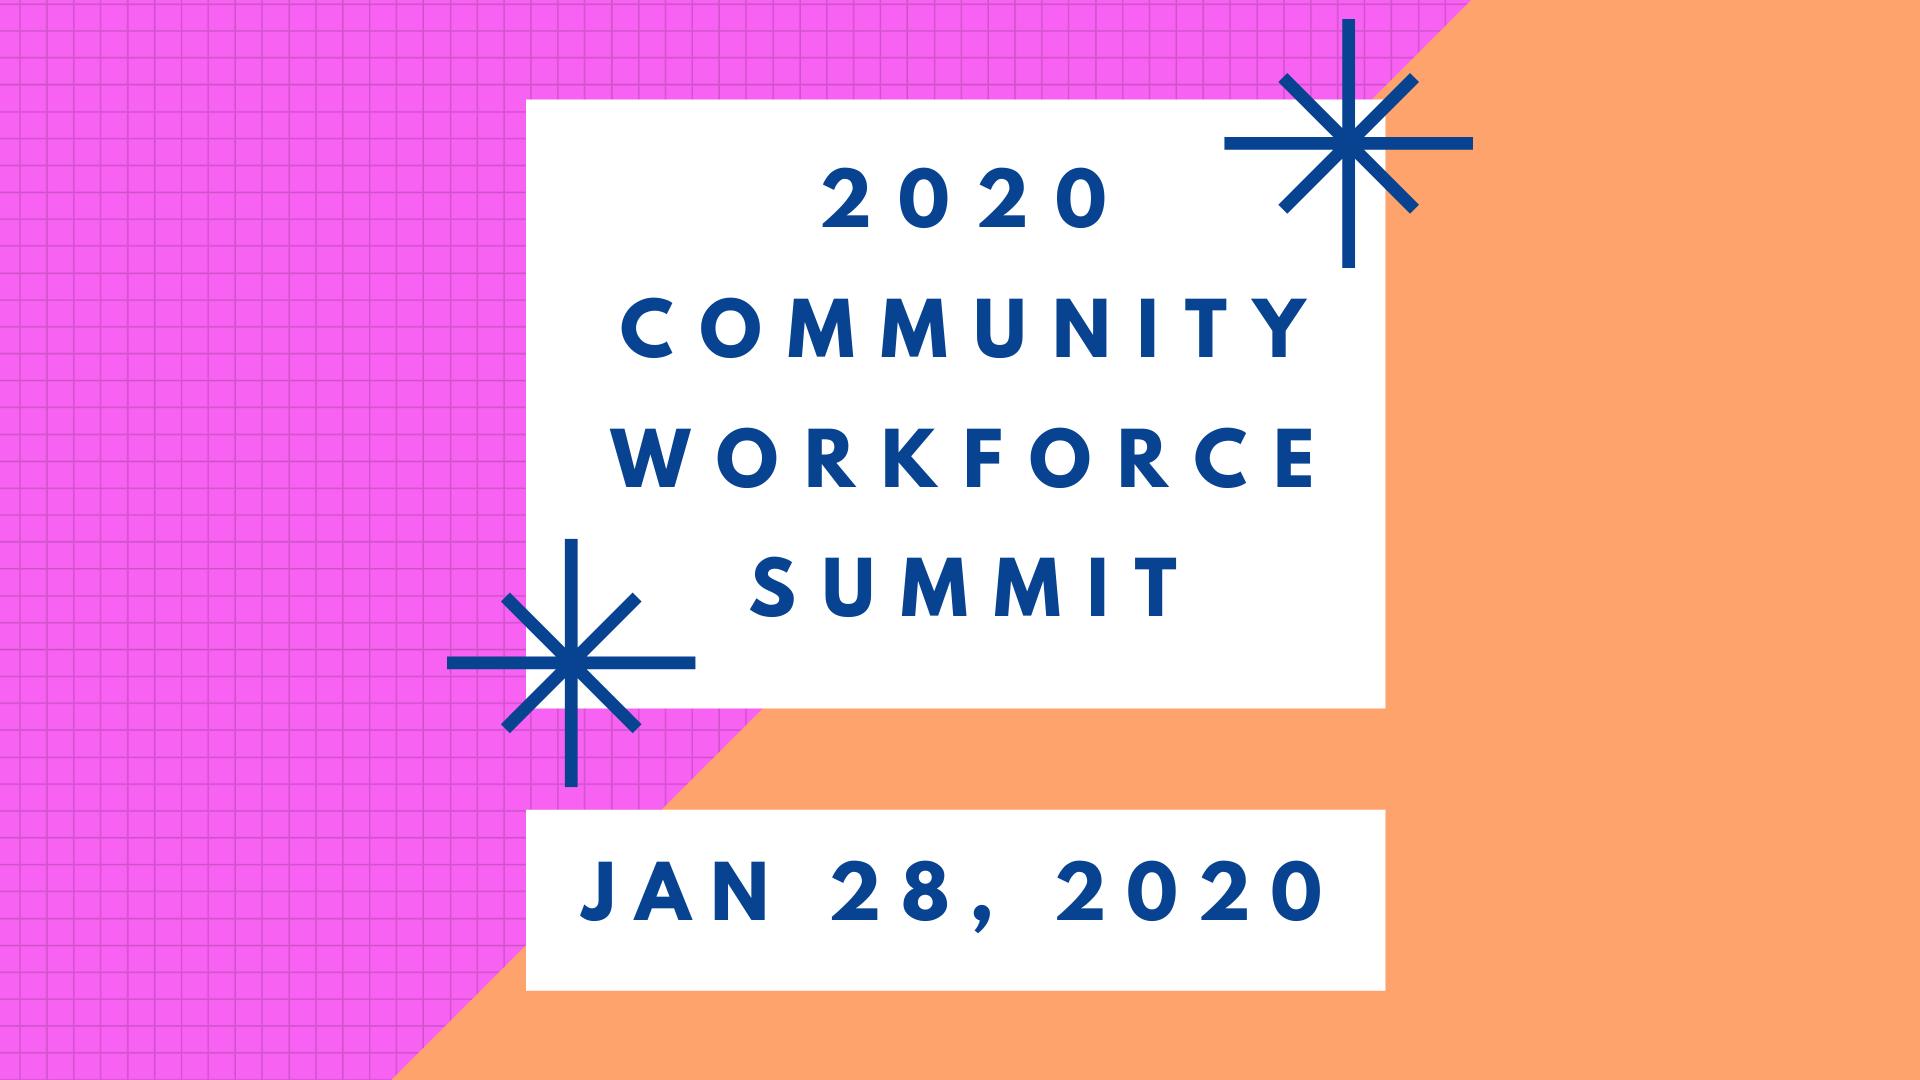 2020 Community Workforce Summit logo